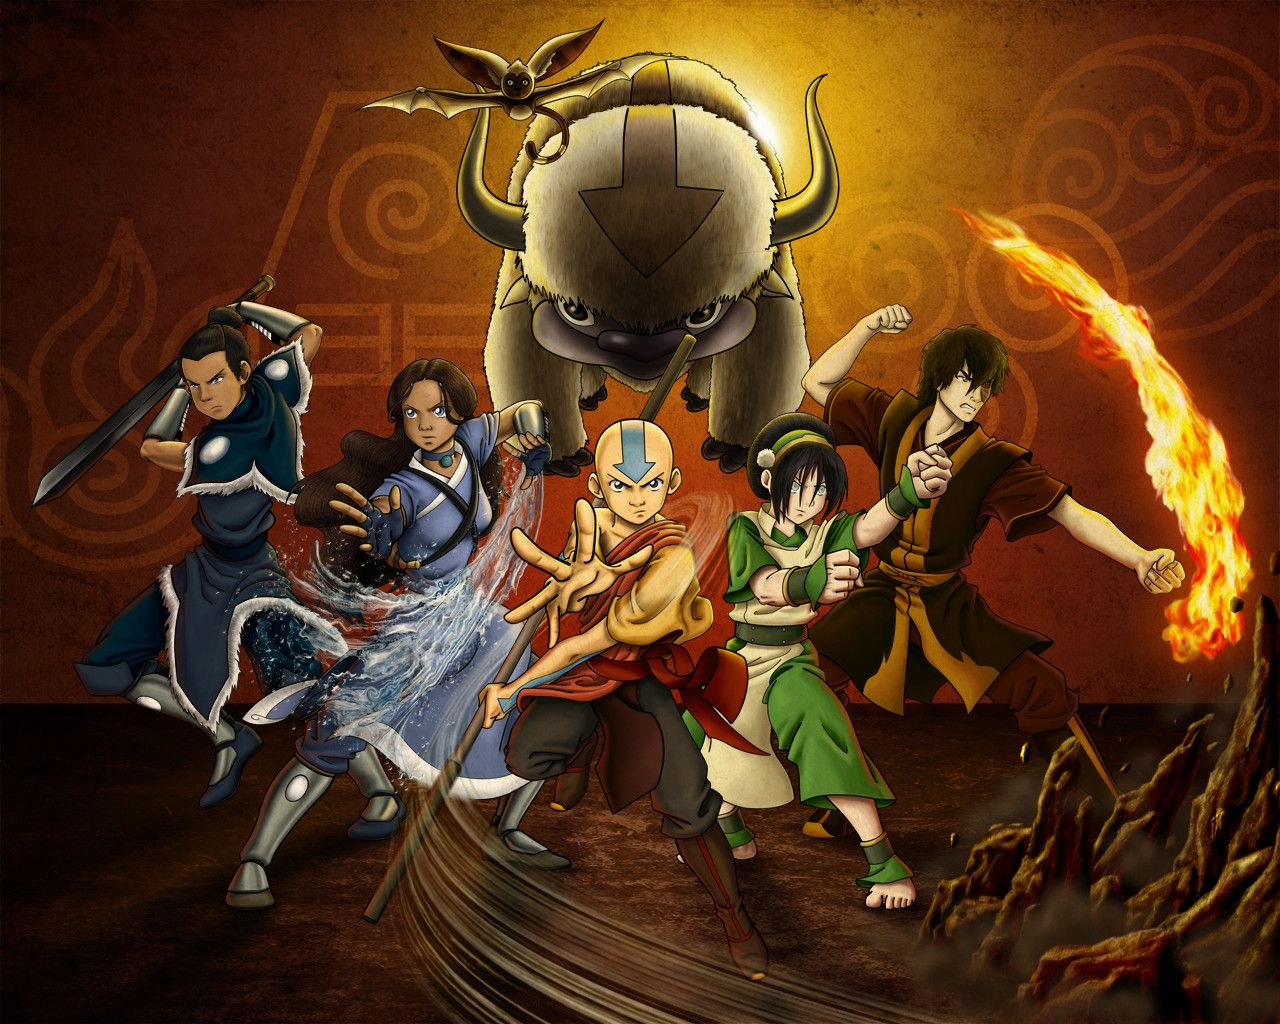 Avatar The Last Airbender Wallpaper Avatar The Last Airbender The Last Airbender Avatar